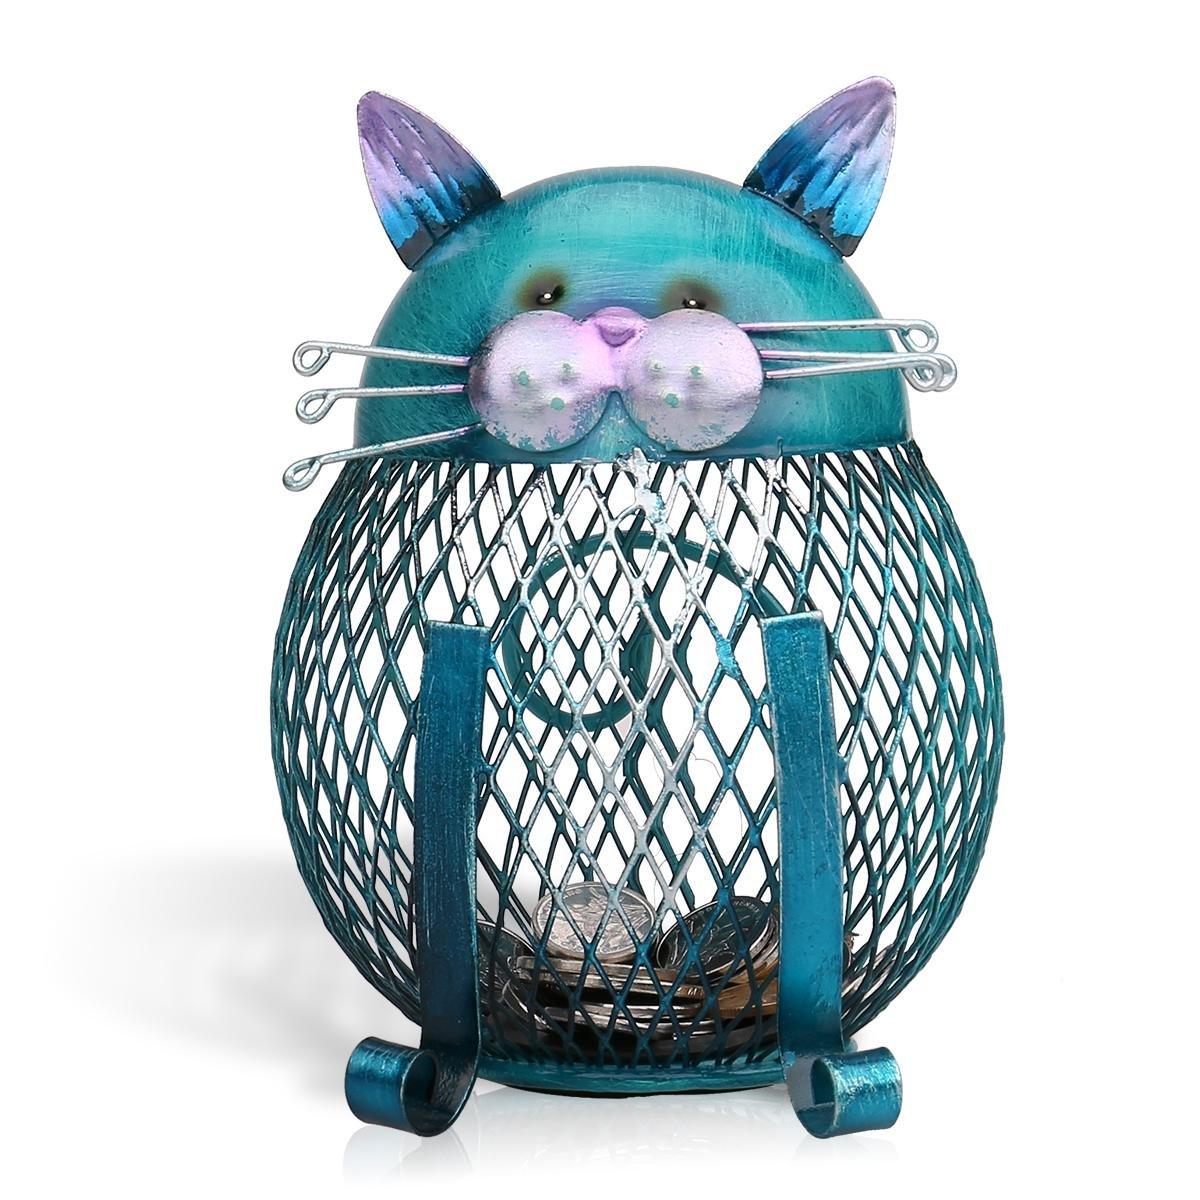 Tooarts Cat Coin Box Piggy Bank Animal Ornament Iron Art Handcrafts A030